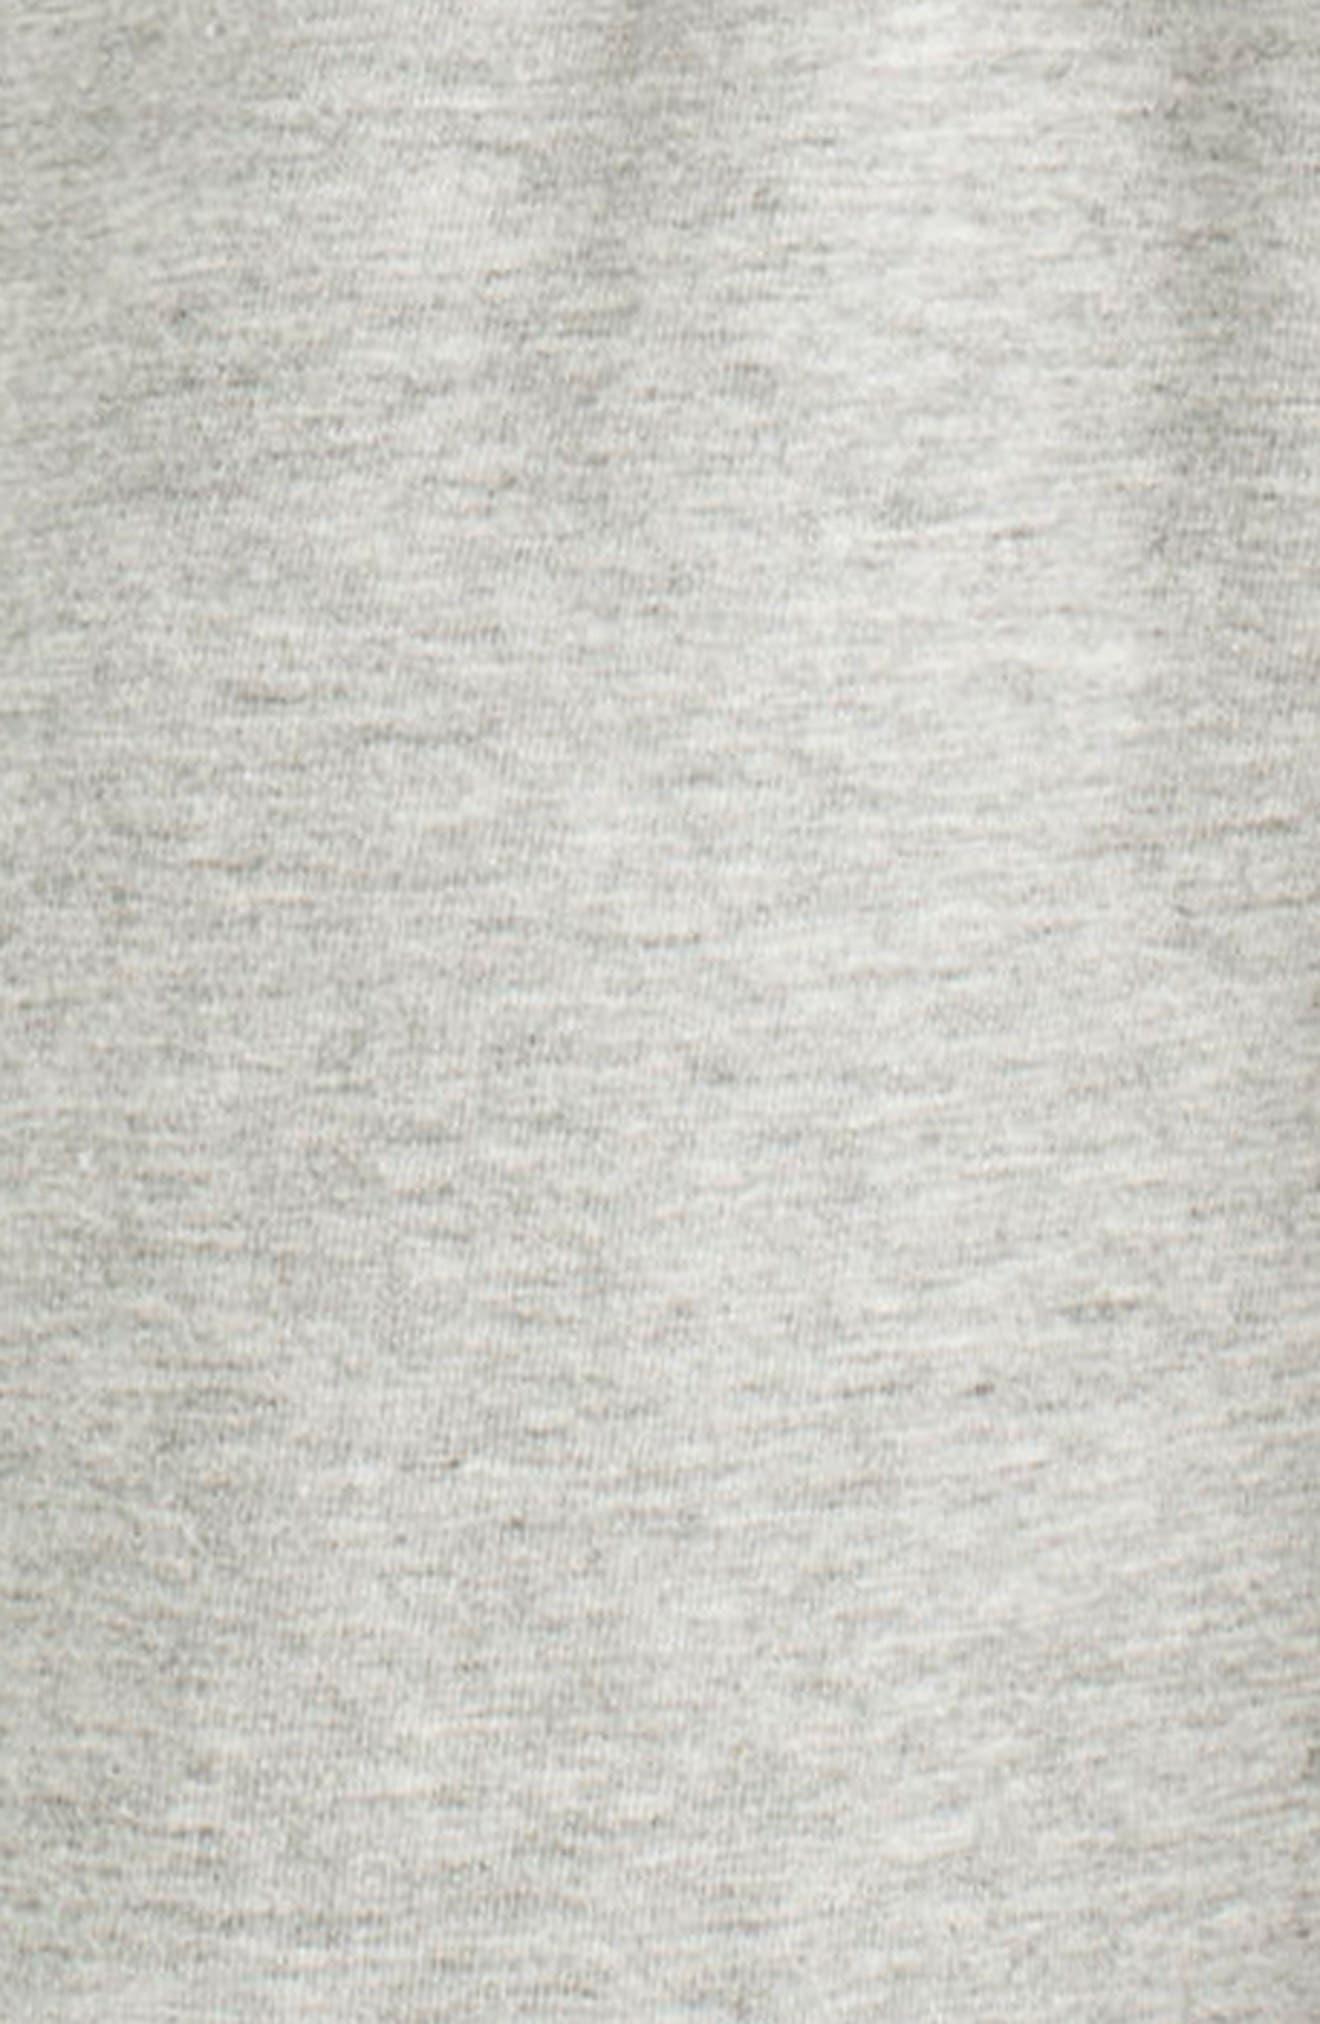 Knit Sleep Shirt,                             Alternate thumbnail 3, color,                             Heather Grey